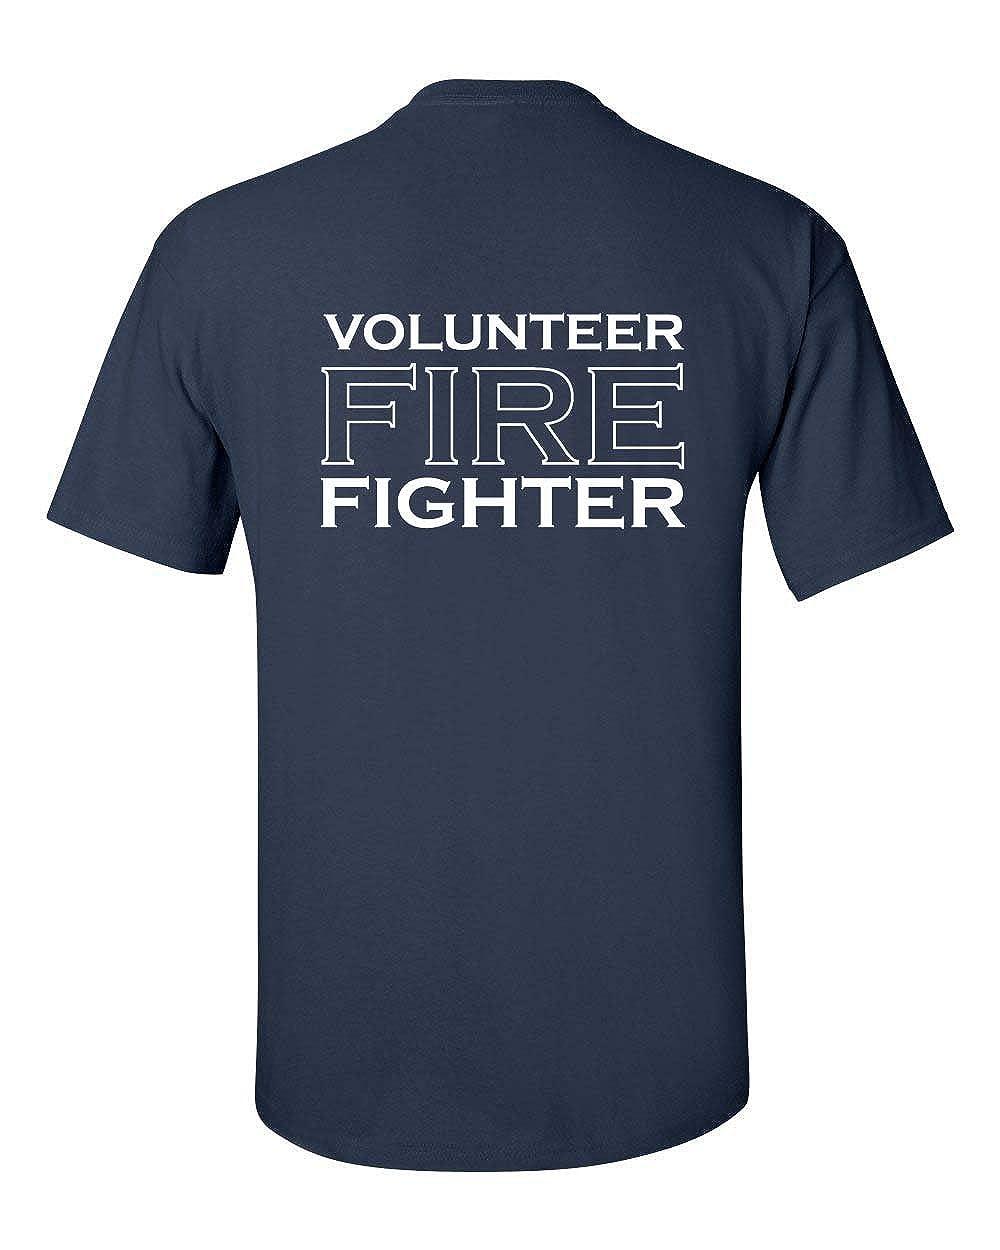 Volunteer Firefighter Badge Printed on Front - Words on Back Men's T-Shirt 22037-$P